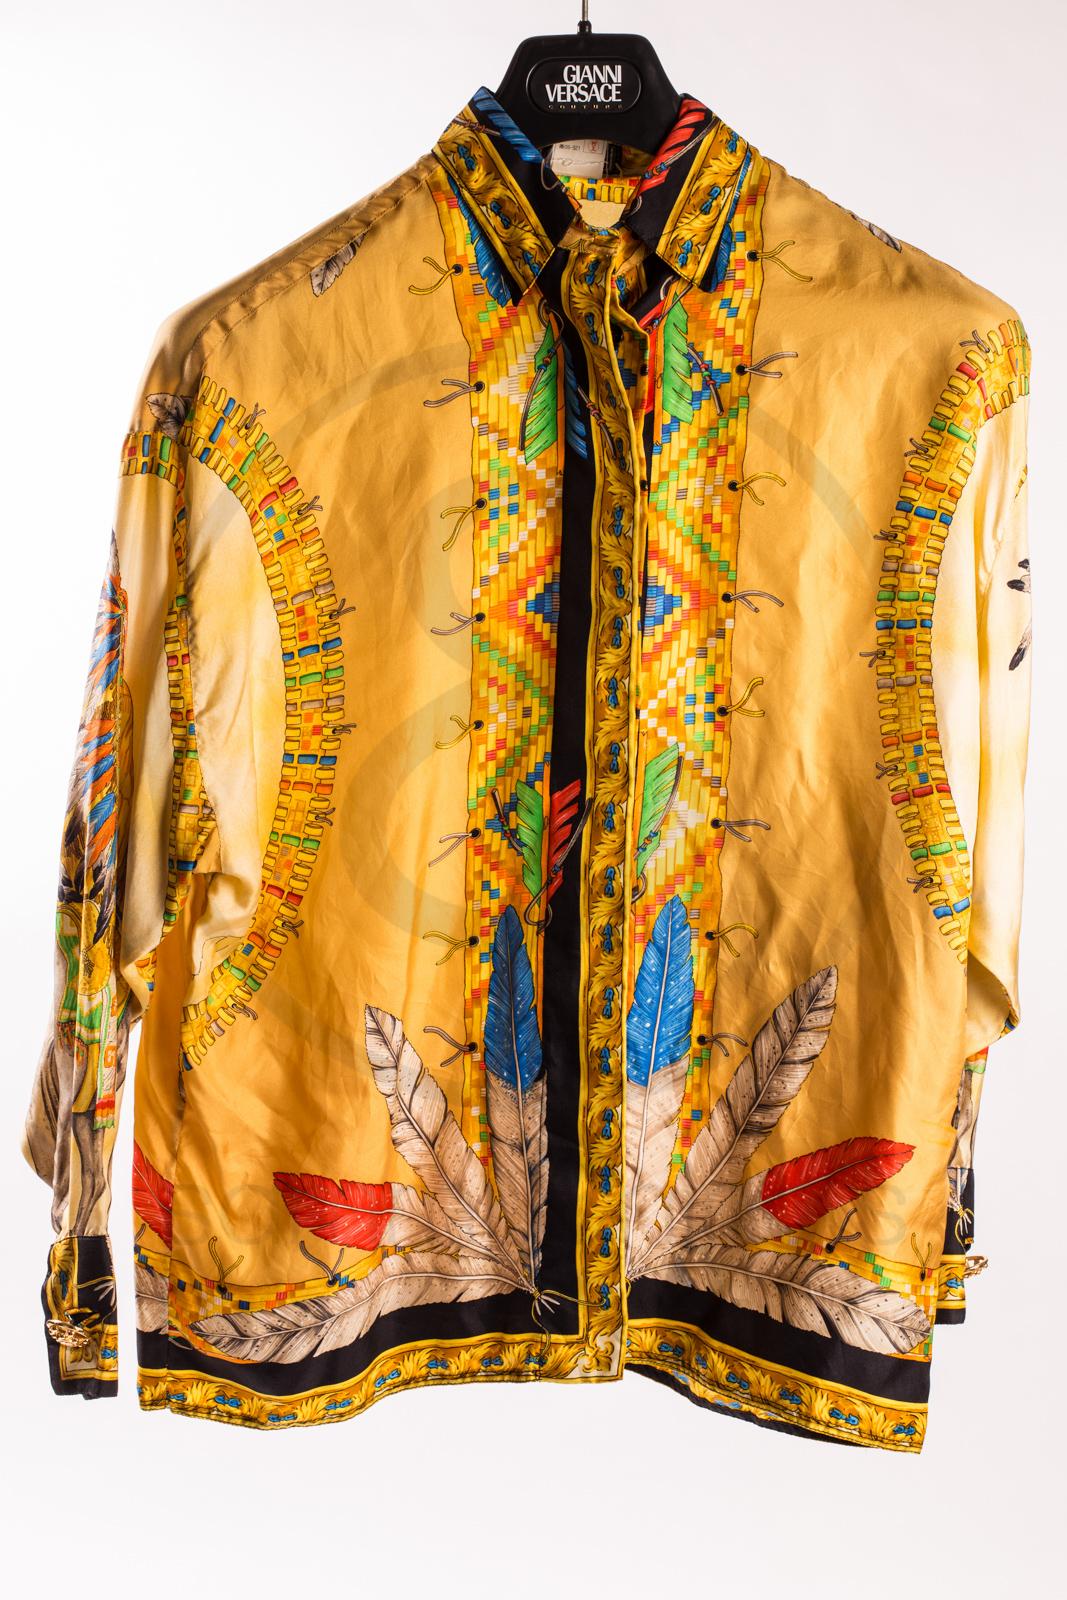 300f0279 Cheap Vintage Versace Silk Shirts - DREAMWORKS